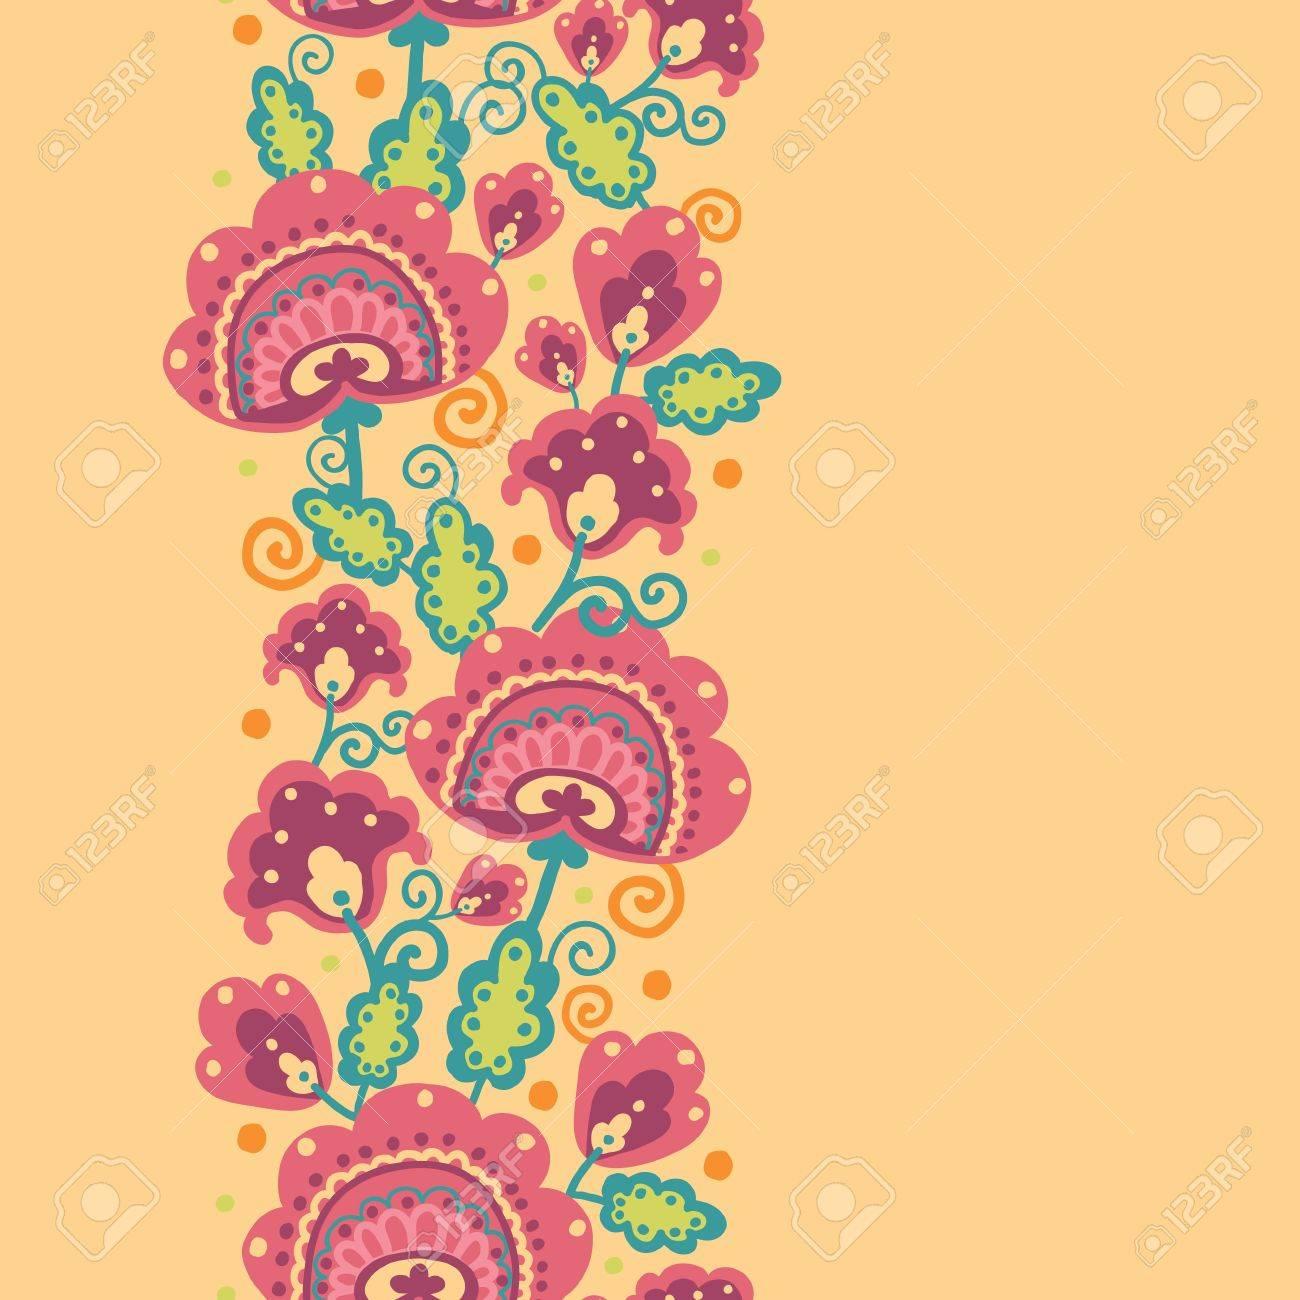 Folk Flowers Vertical Seamless Pattern Background Border Stock Vector - 16564759